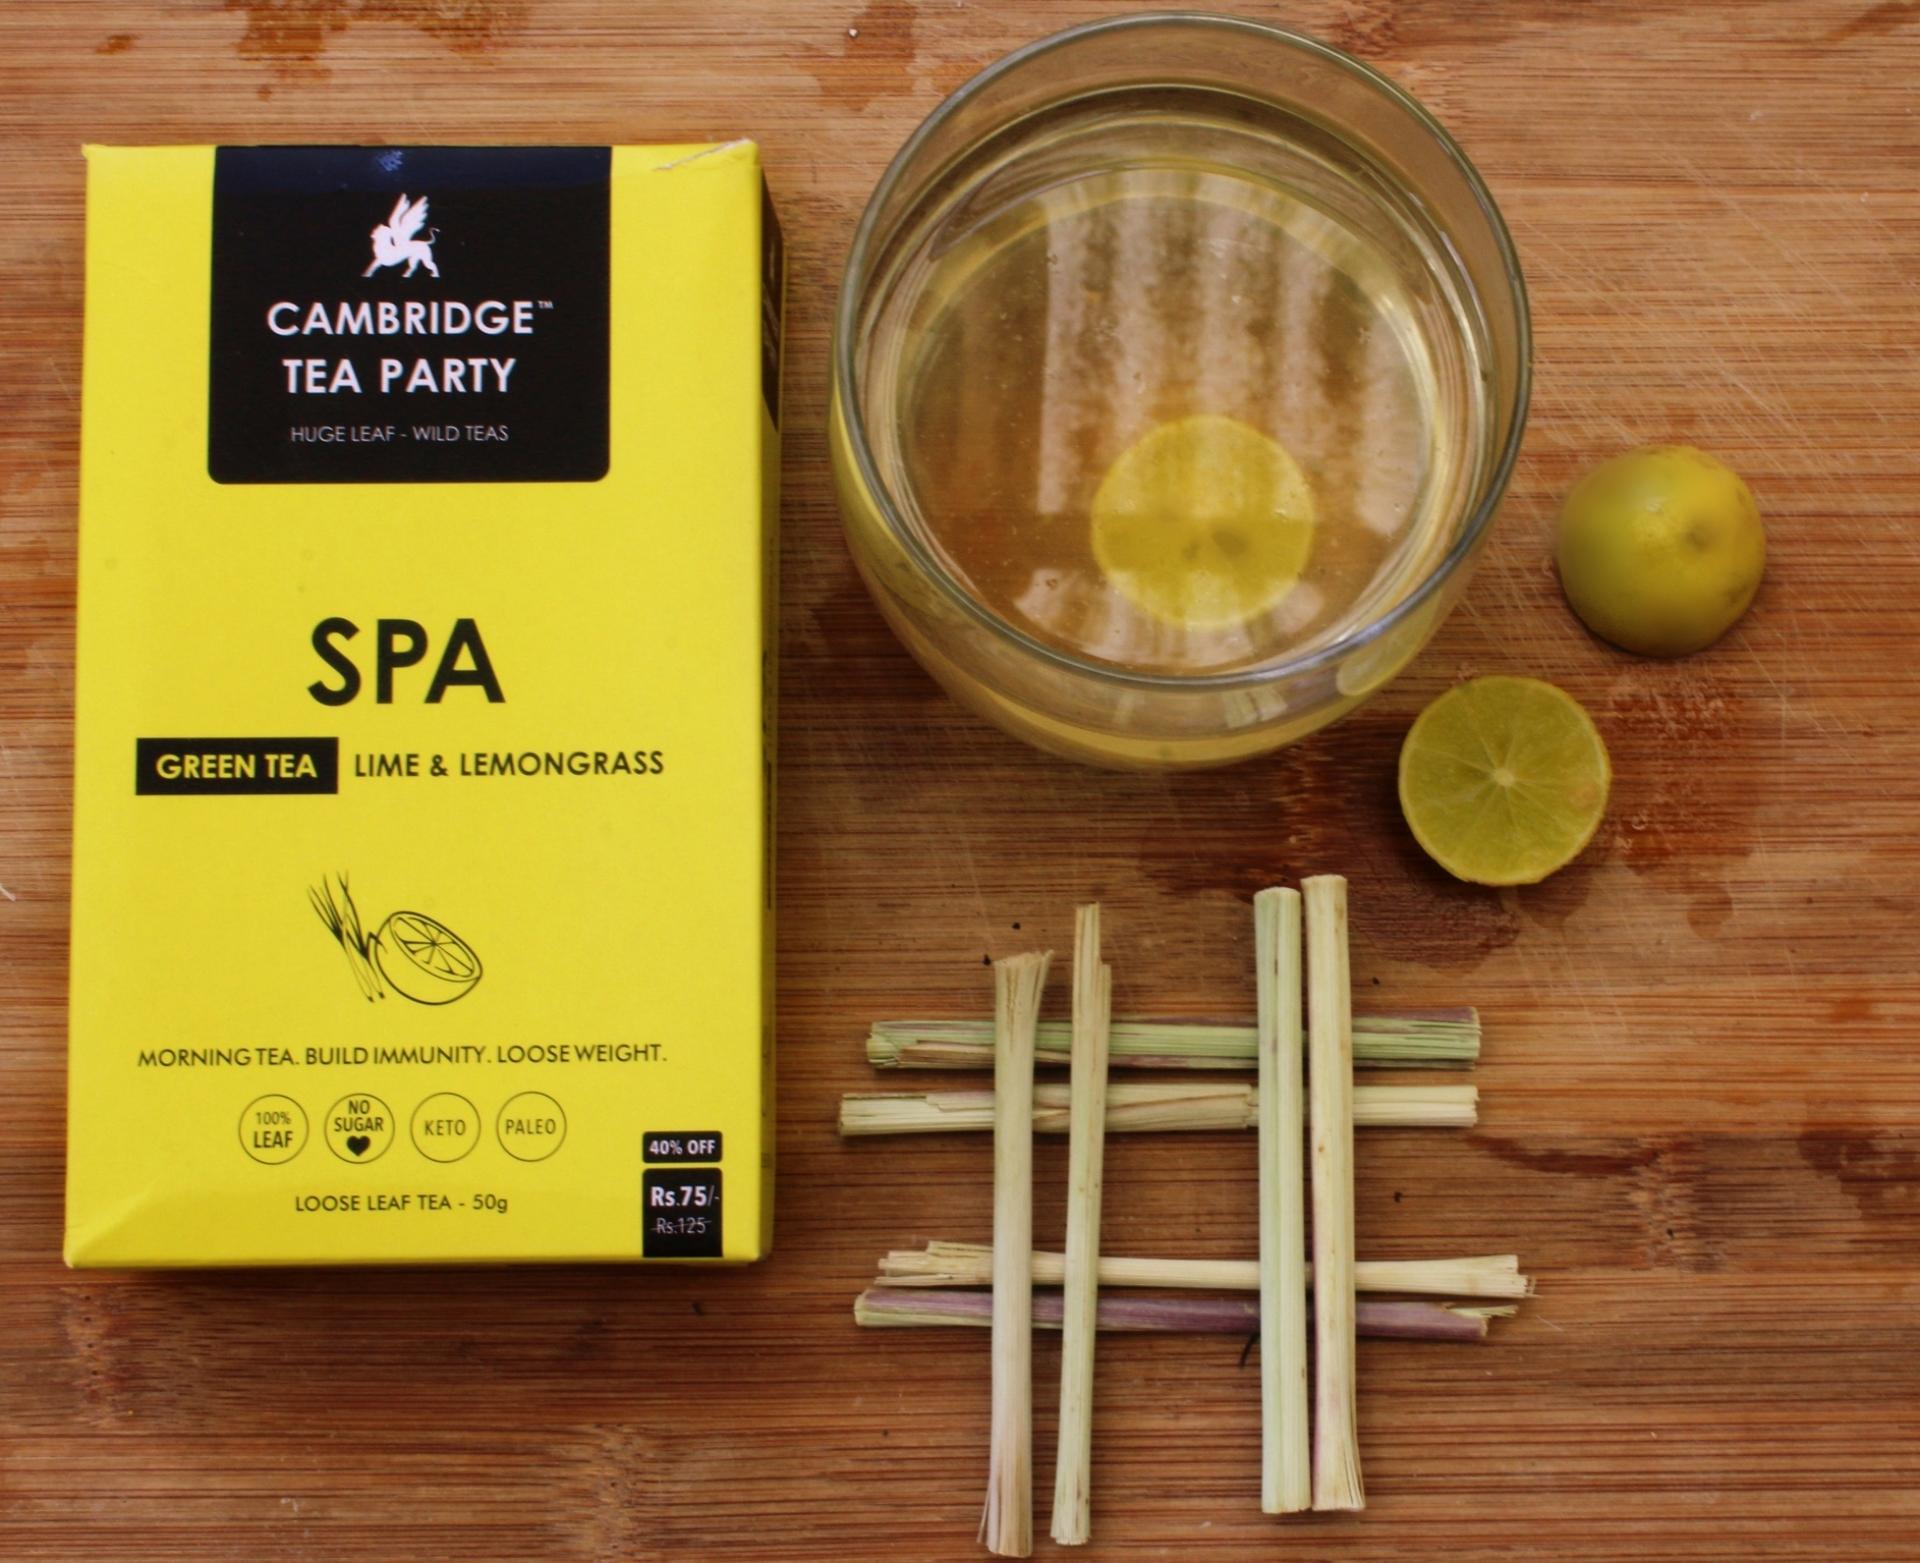 Cambridge Tea Party Lime and Lemongrass